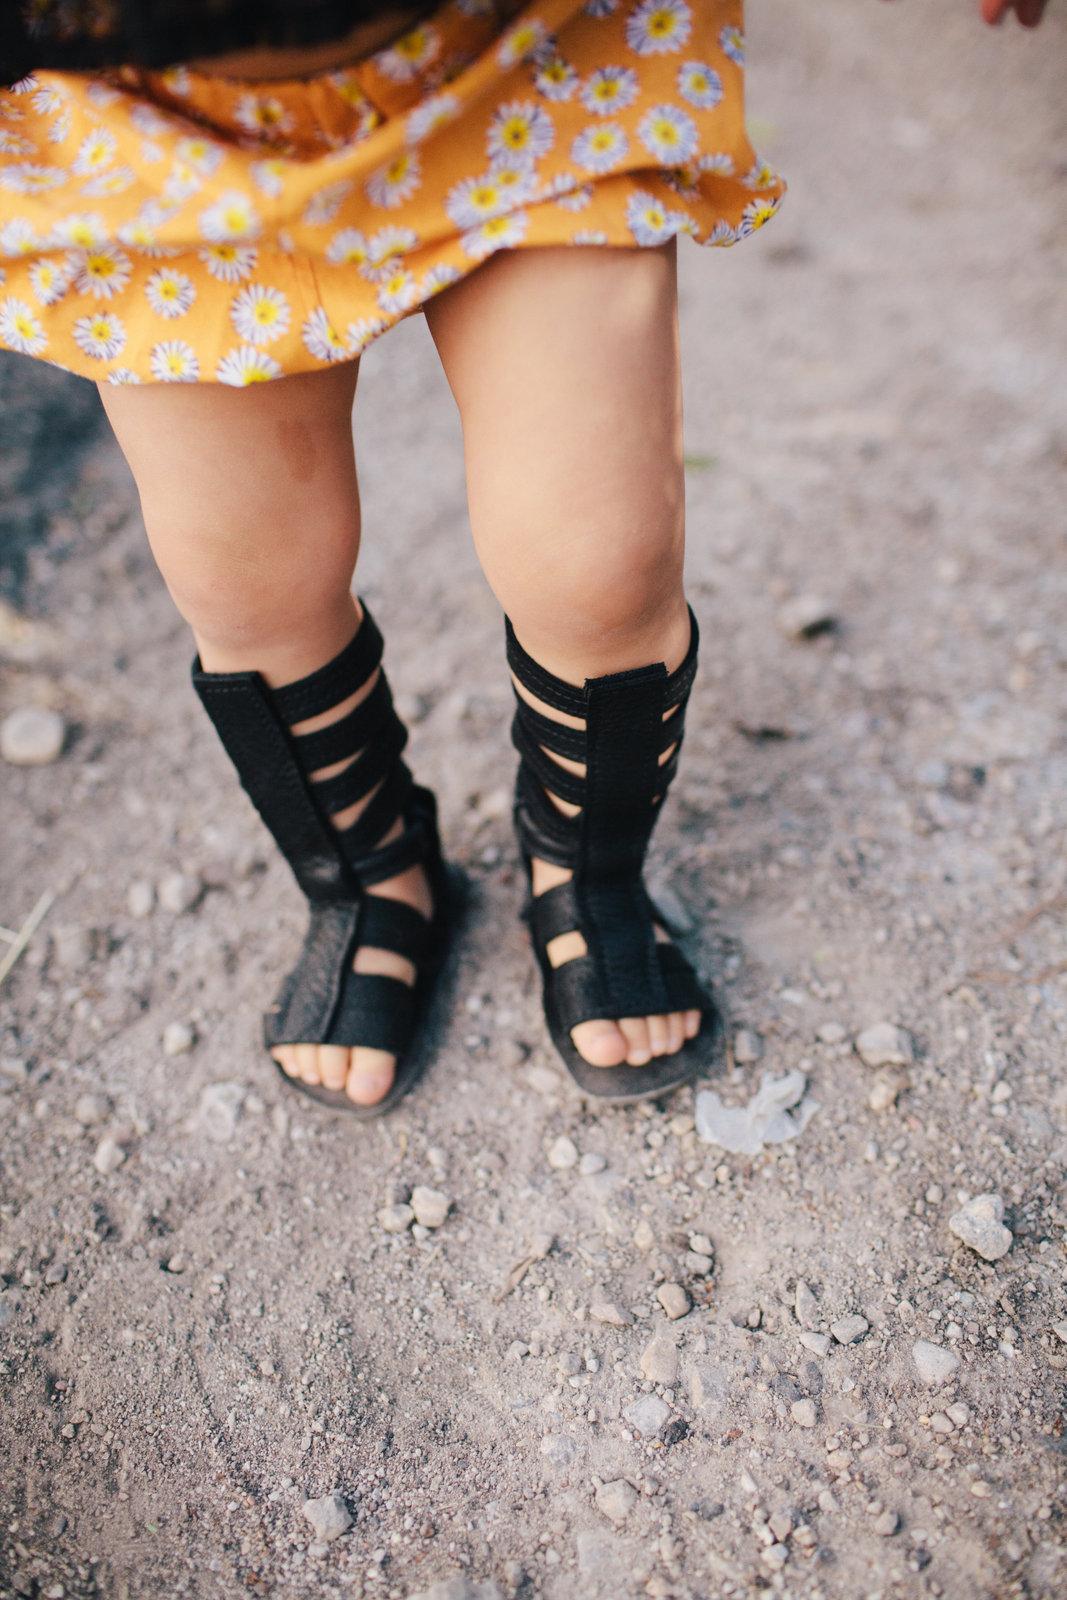 Urbemm gladiator sandals